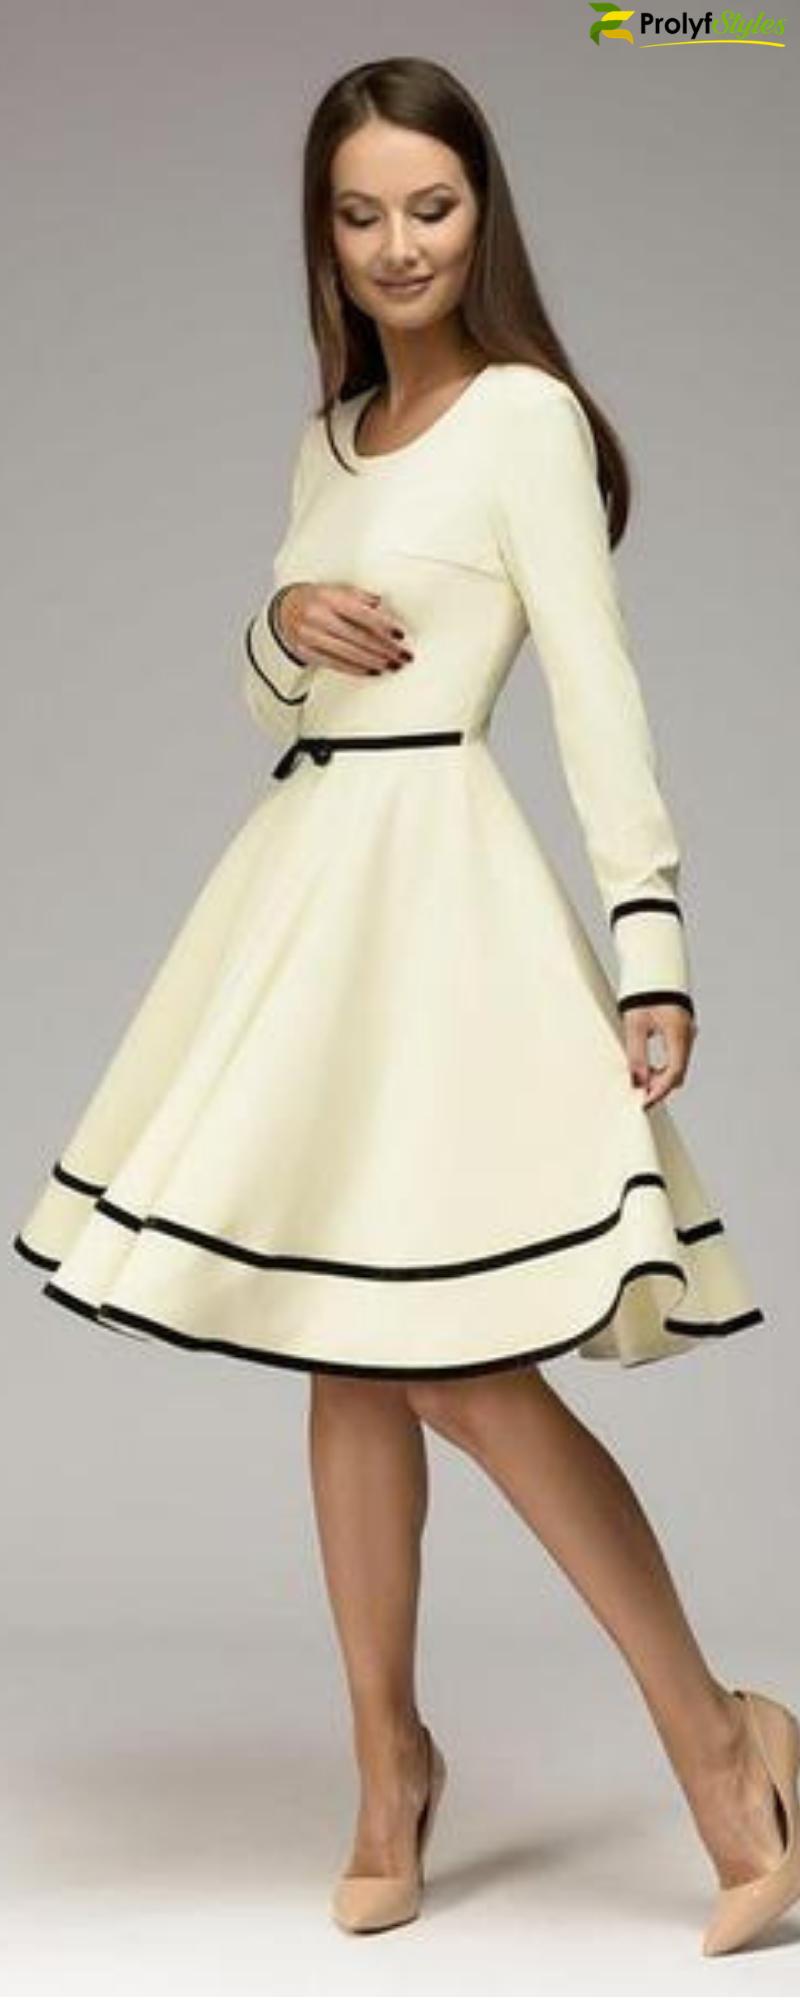 0bc8f97df6 Flare dress, casual dress, a-line dress, knee length dress, long sleeve  dress, a-line dress work, stylish fall dress #dress, plus size dresses,  creme dress, ...